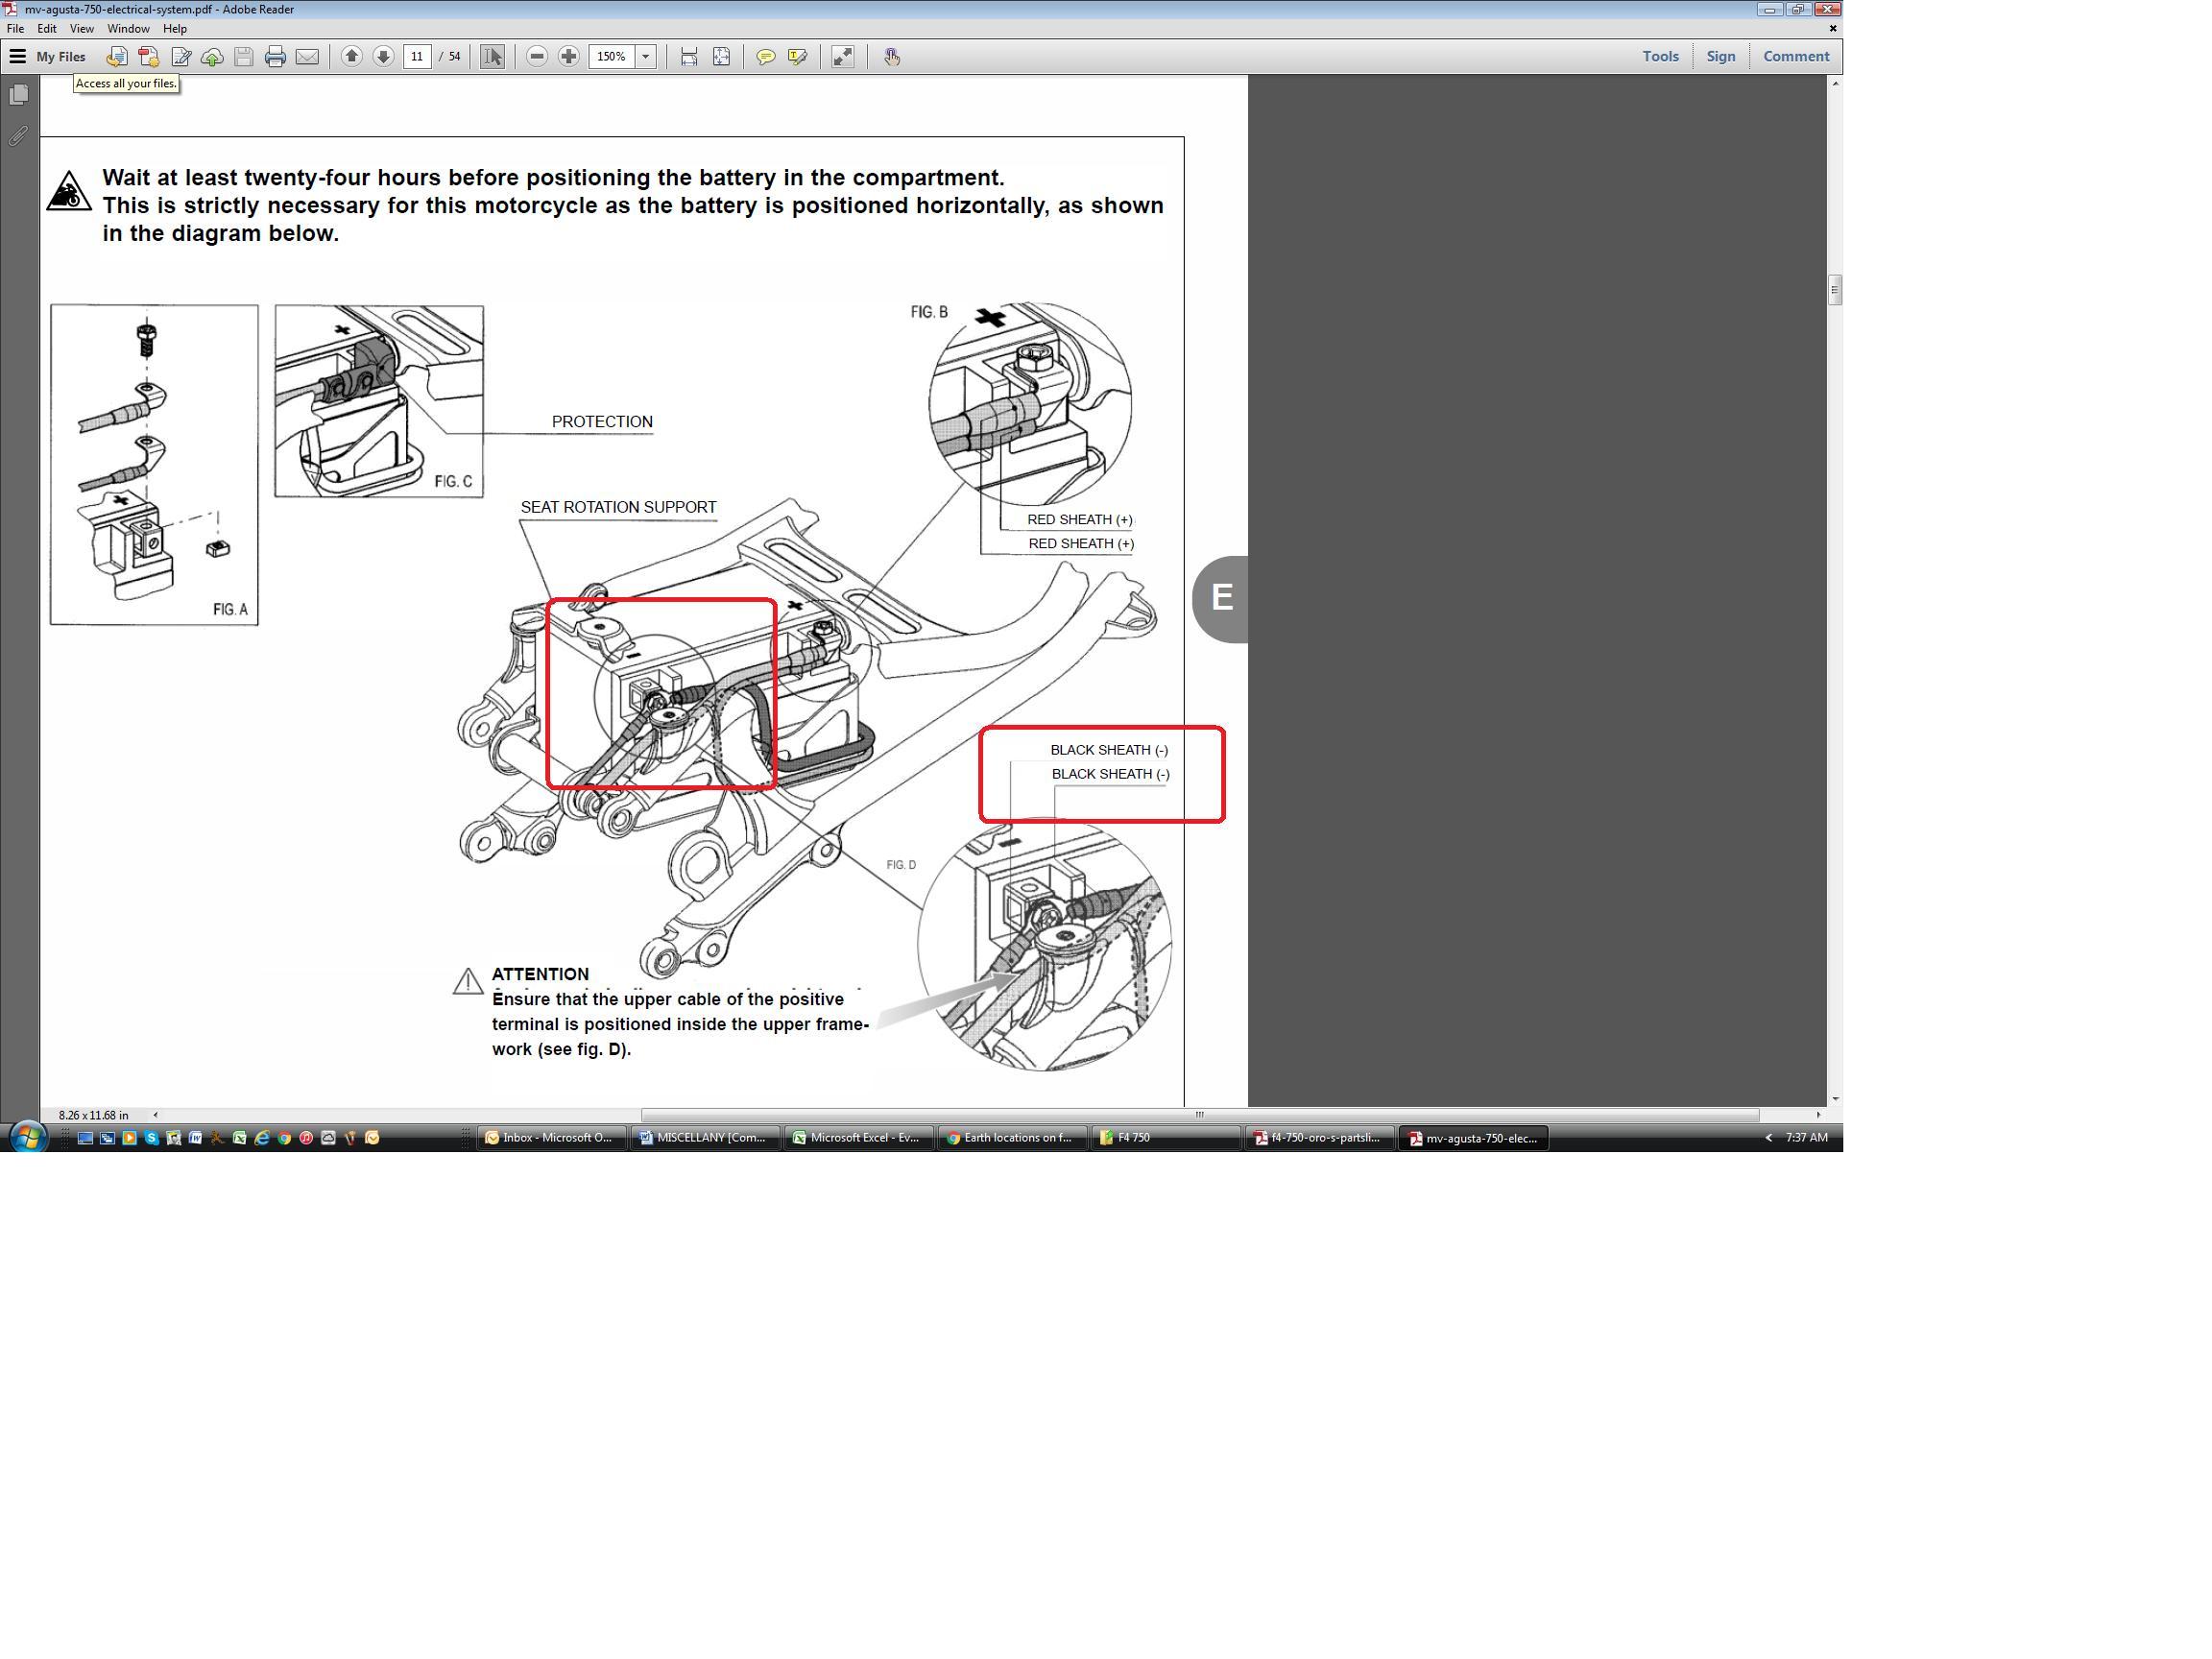 mv agusta brutale wiring diagram earth locations on f4 750 mv agusta forum  earth locations on f4 750 mv agusta forum